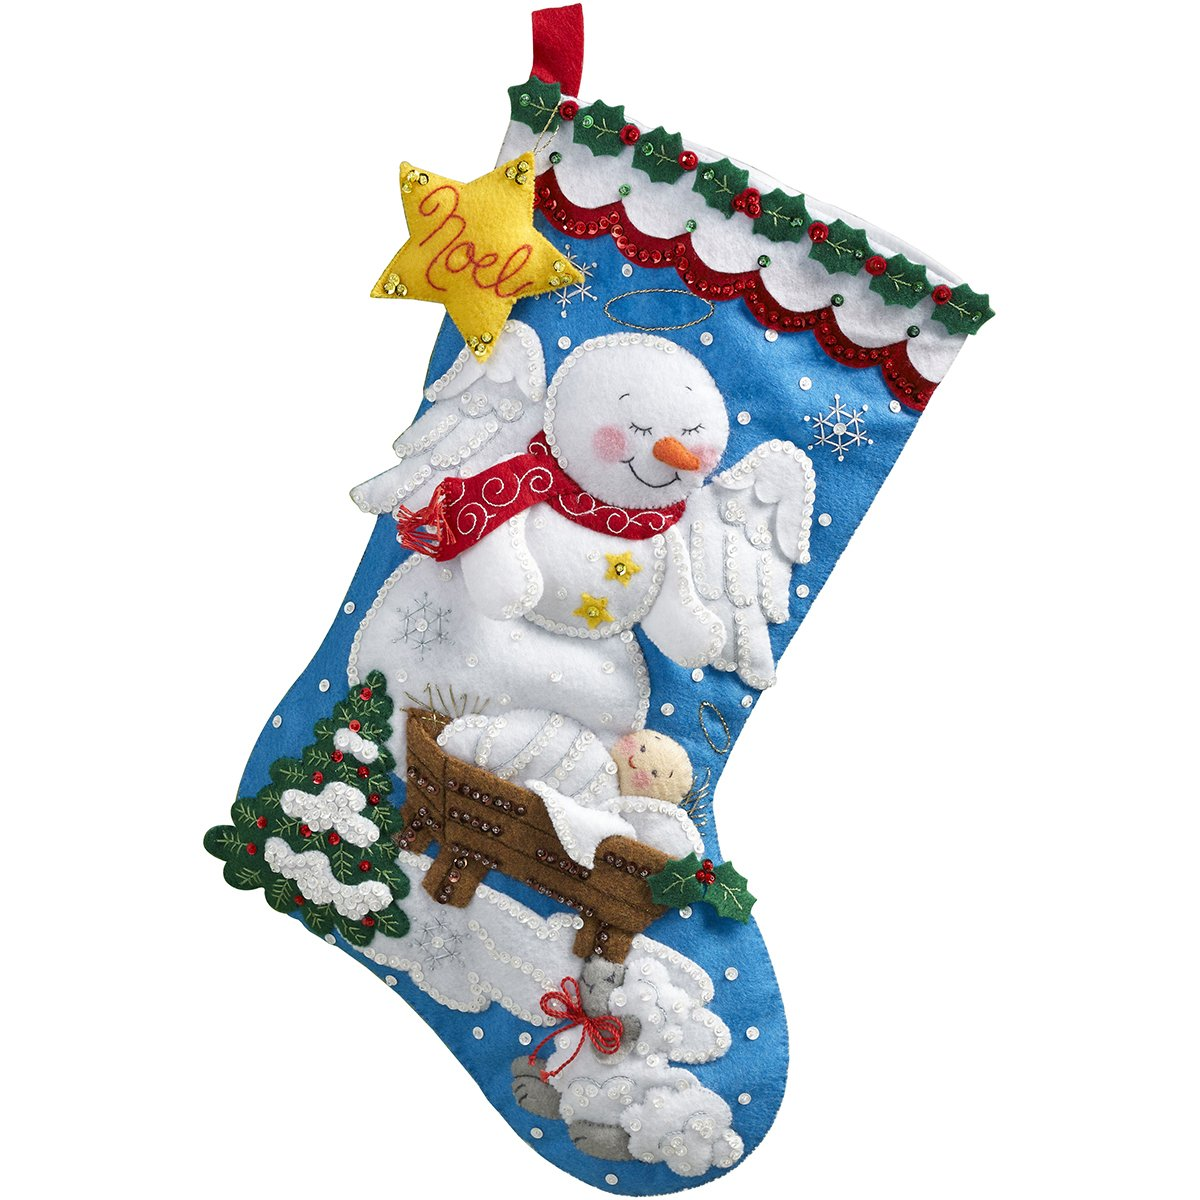 Bucilla 18-Inch Christmas Stocking Felt Applique Kit, 86646 Snow Angel Plaid Inc dimensions needlecrafts holiday stitchery